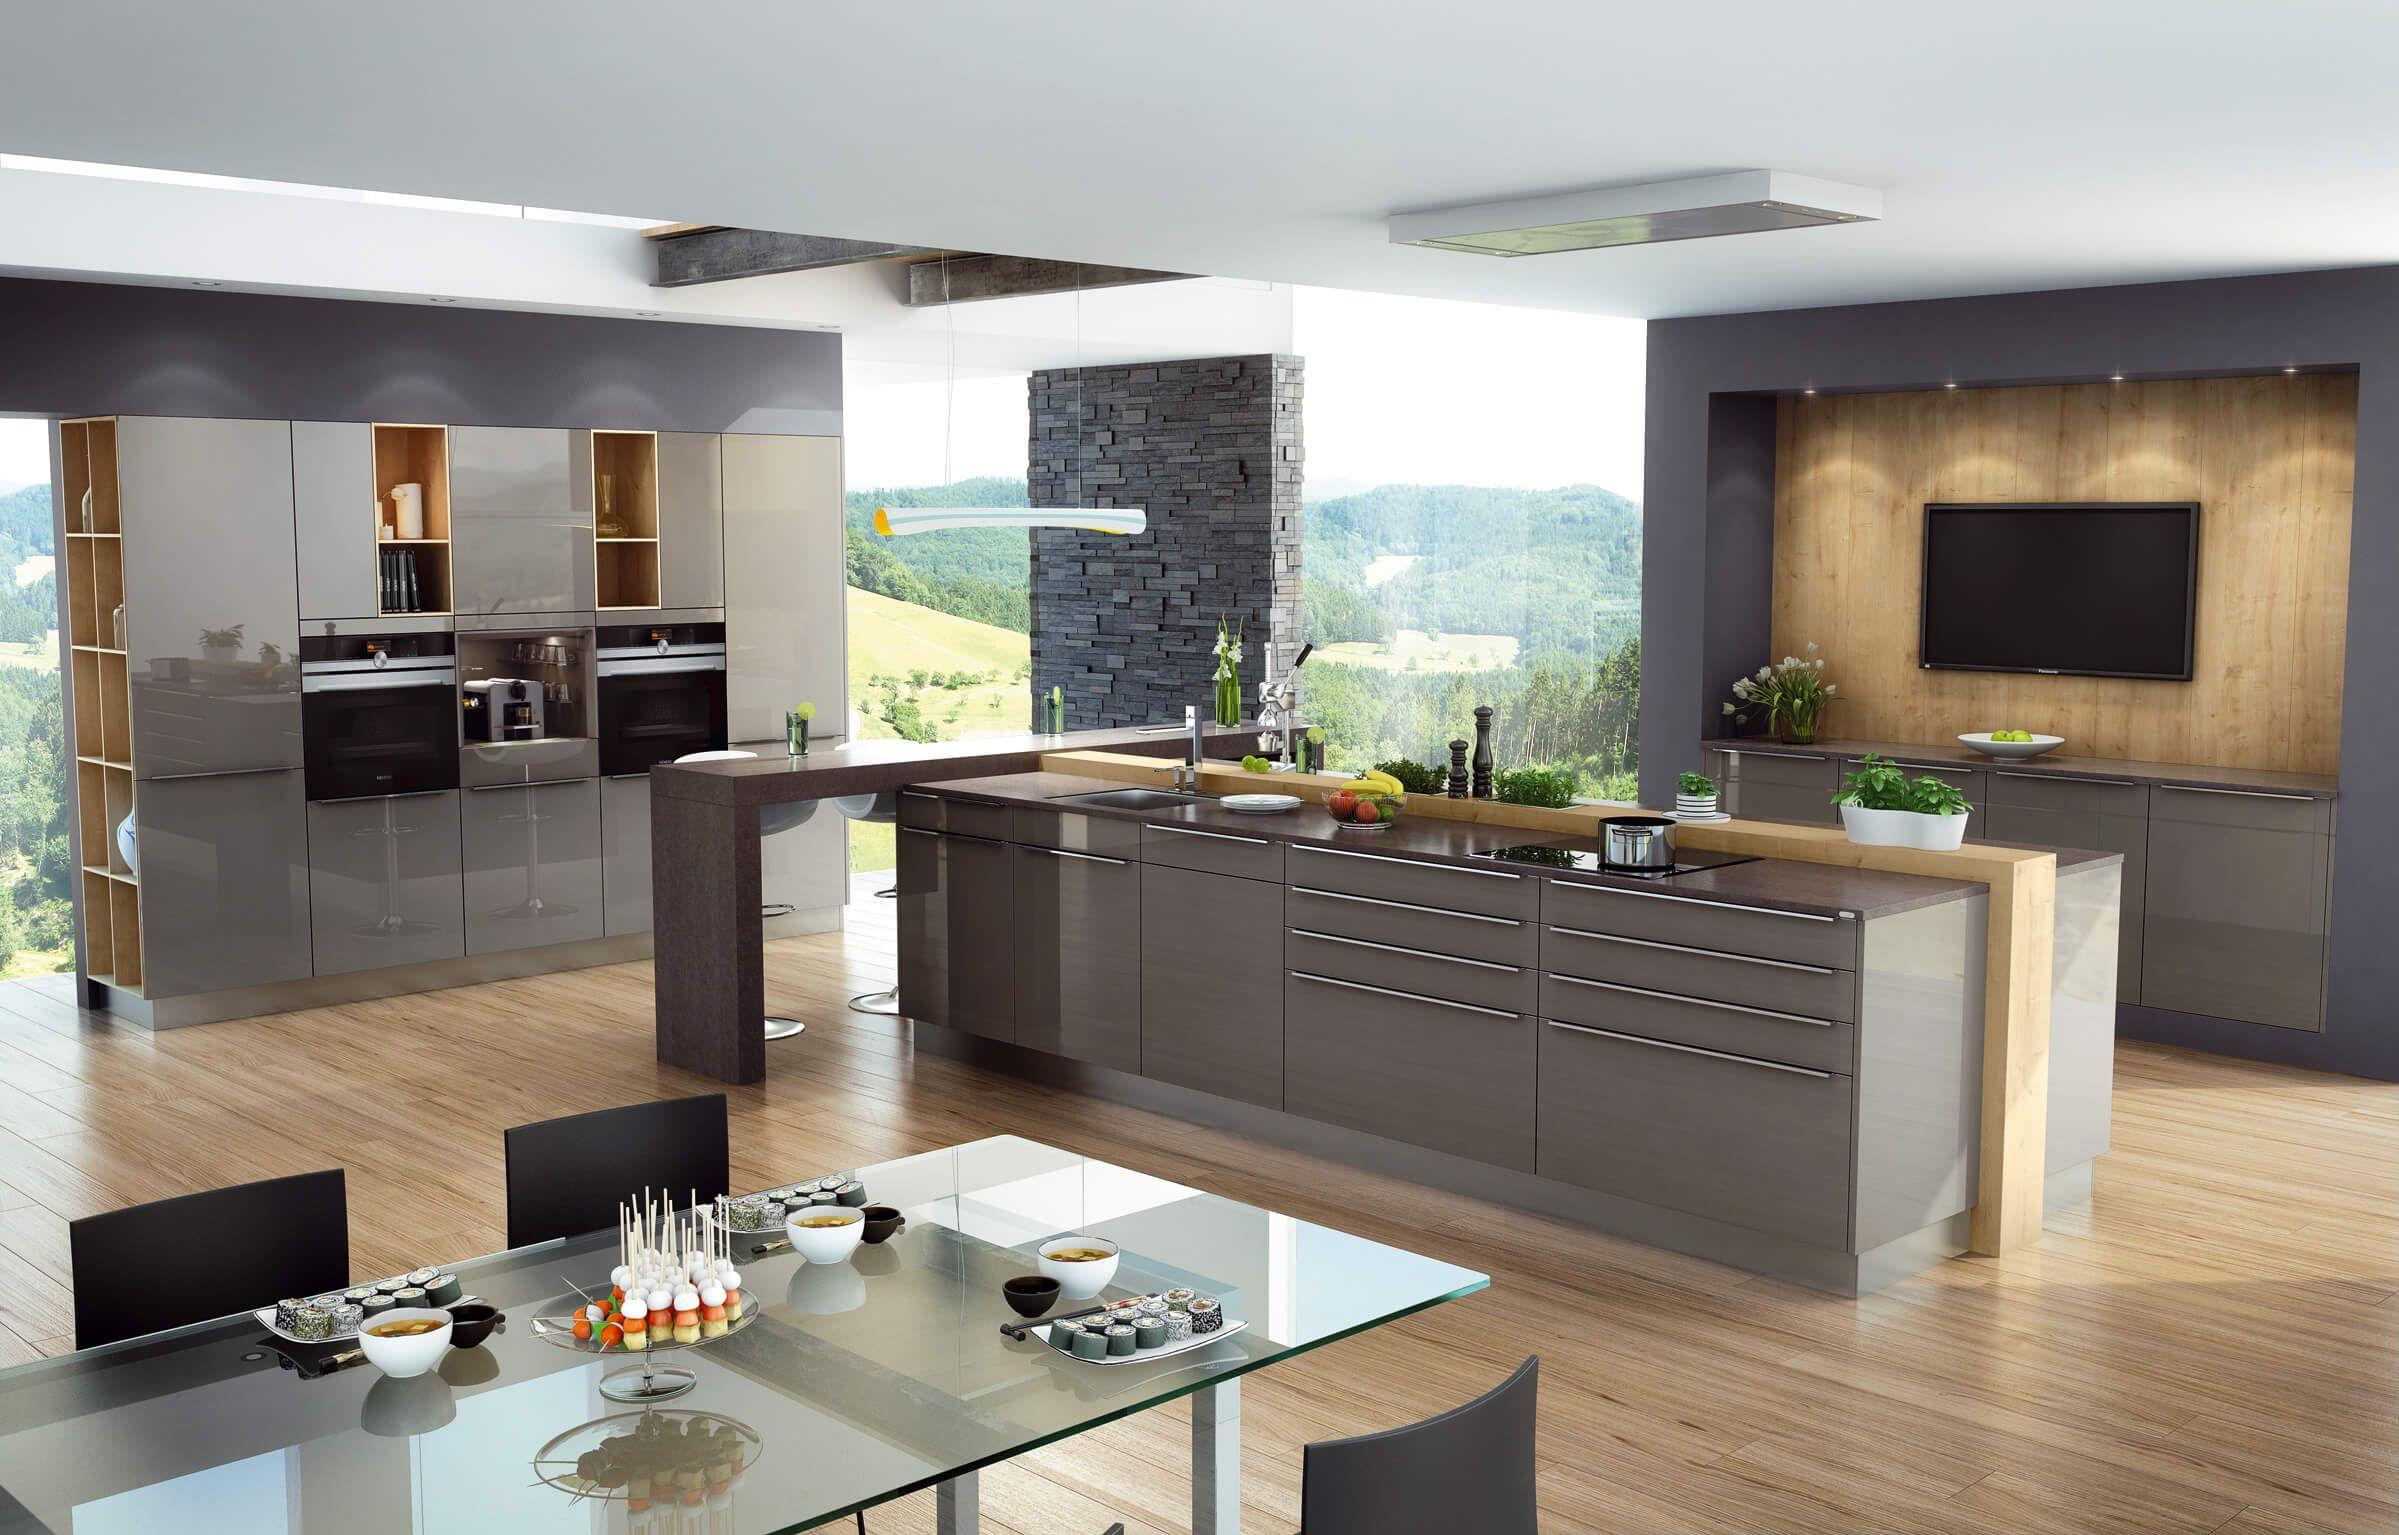 Kuche hochglanz grau fronten lack kuchenfronten for Küche hochglanz